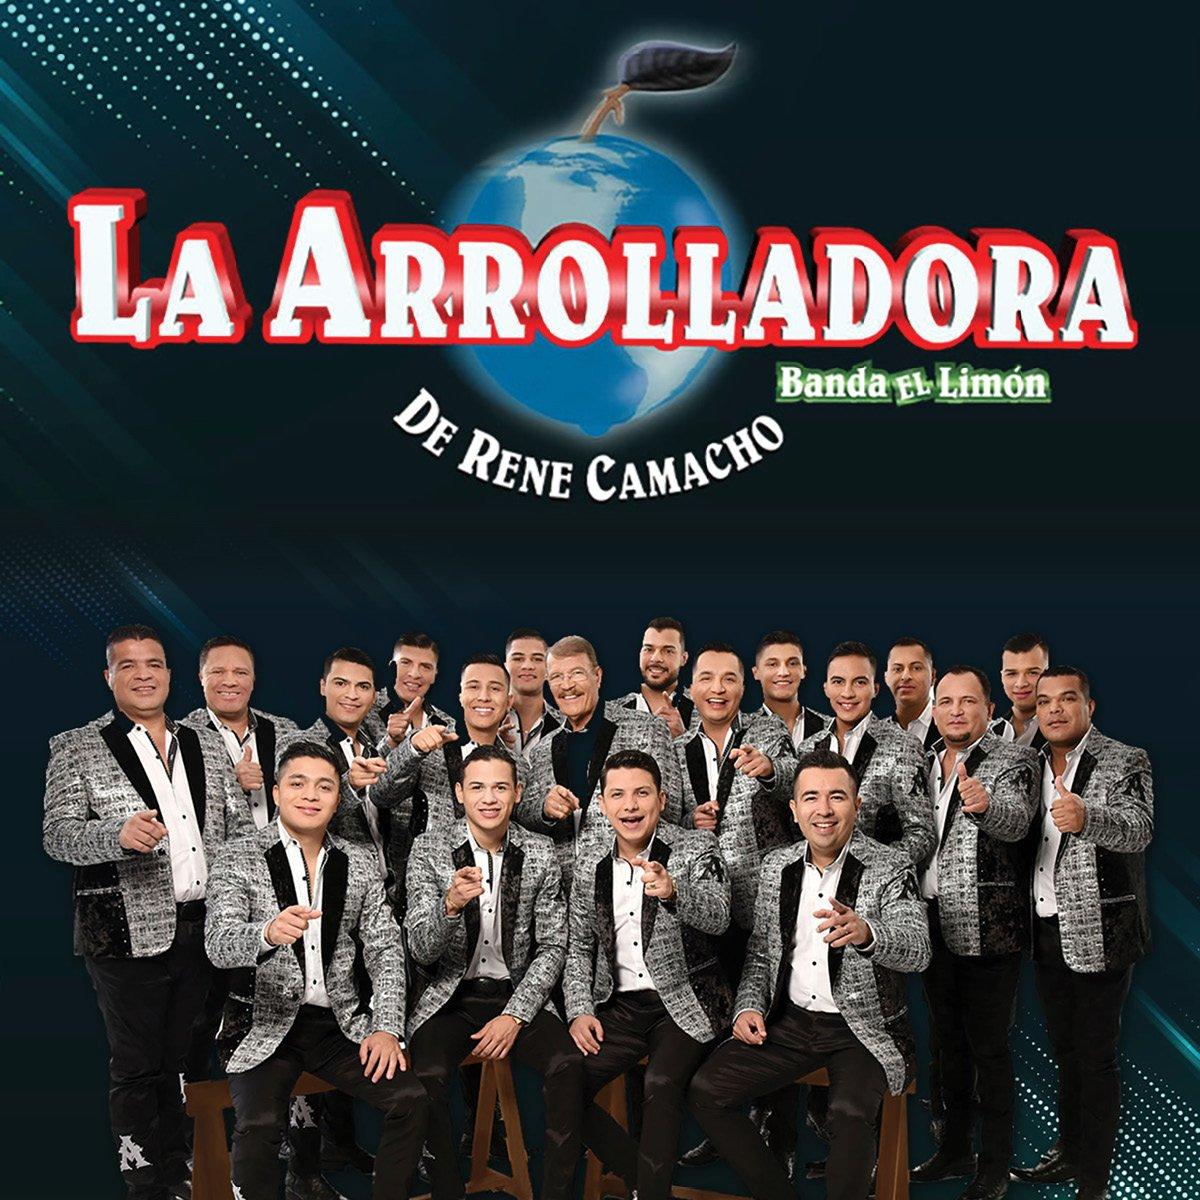 Tickets still available! Saturday, Oct. 12th @ the Starlight Theater https://bit.ly/2MT2O2G  Who has seen them live before?  #laarrolladora #bailes #quebuena #temeculafun #bailandobanda #sinaloa @arrolladoraoficialpic.twitter.com/0VimhYGzE4